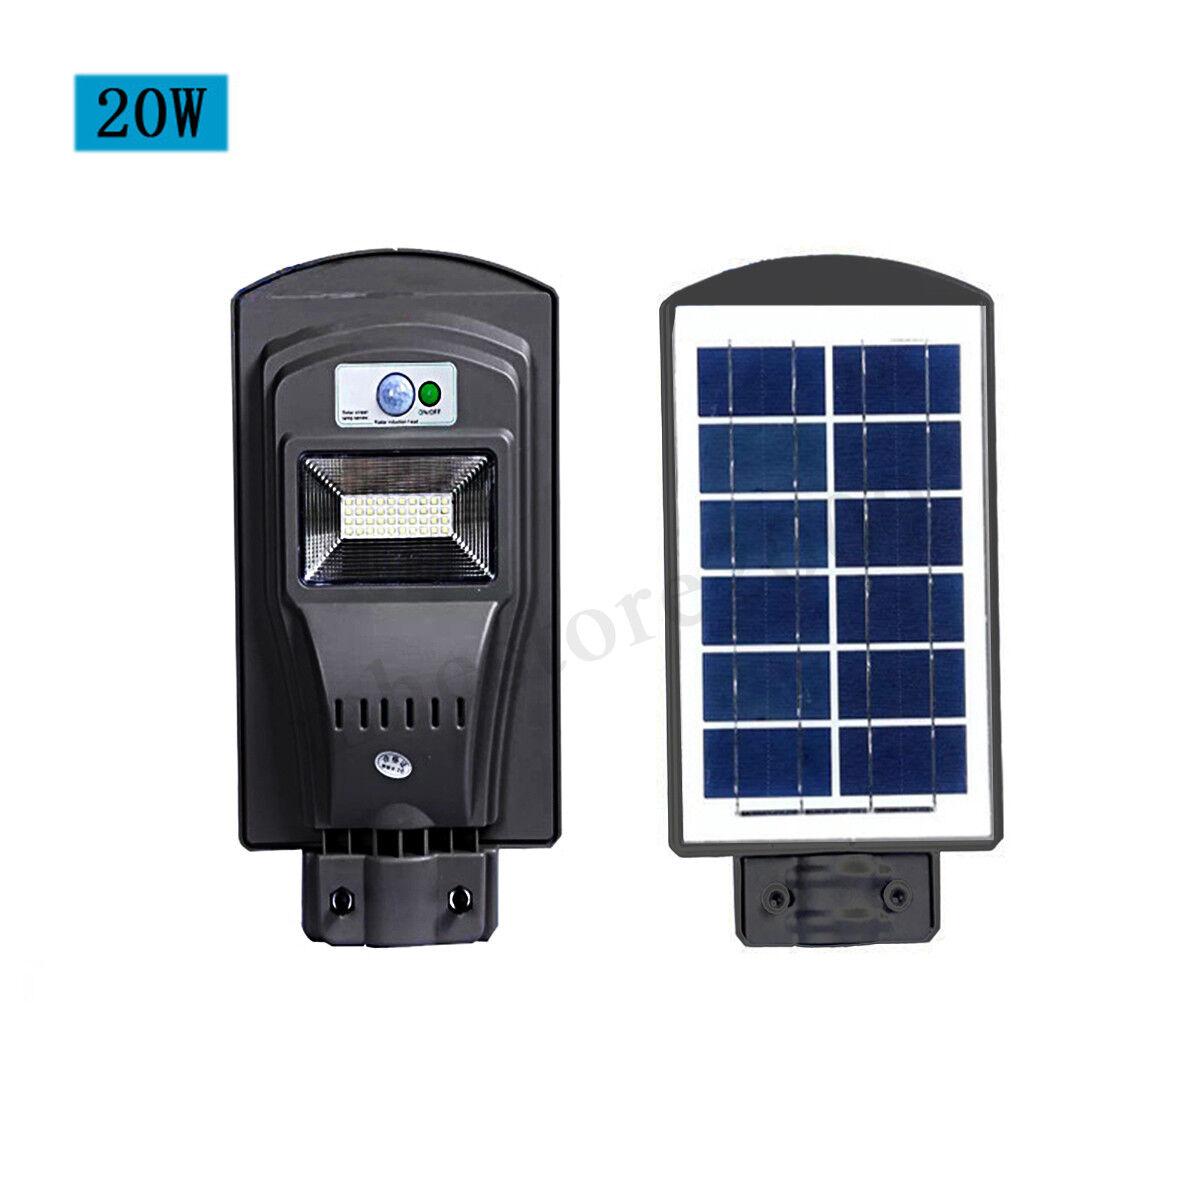 20W 40W 60W LED Solar Power Street Light Wall PIR PIR PIR Motion Sensor Lamp Outdoor Lot 729b14